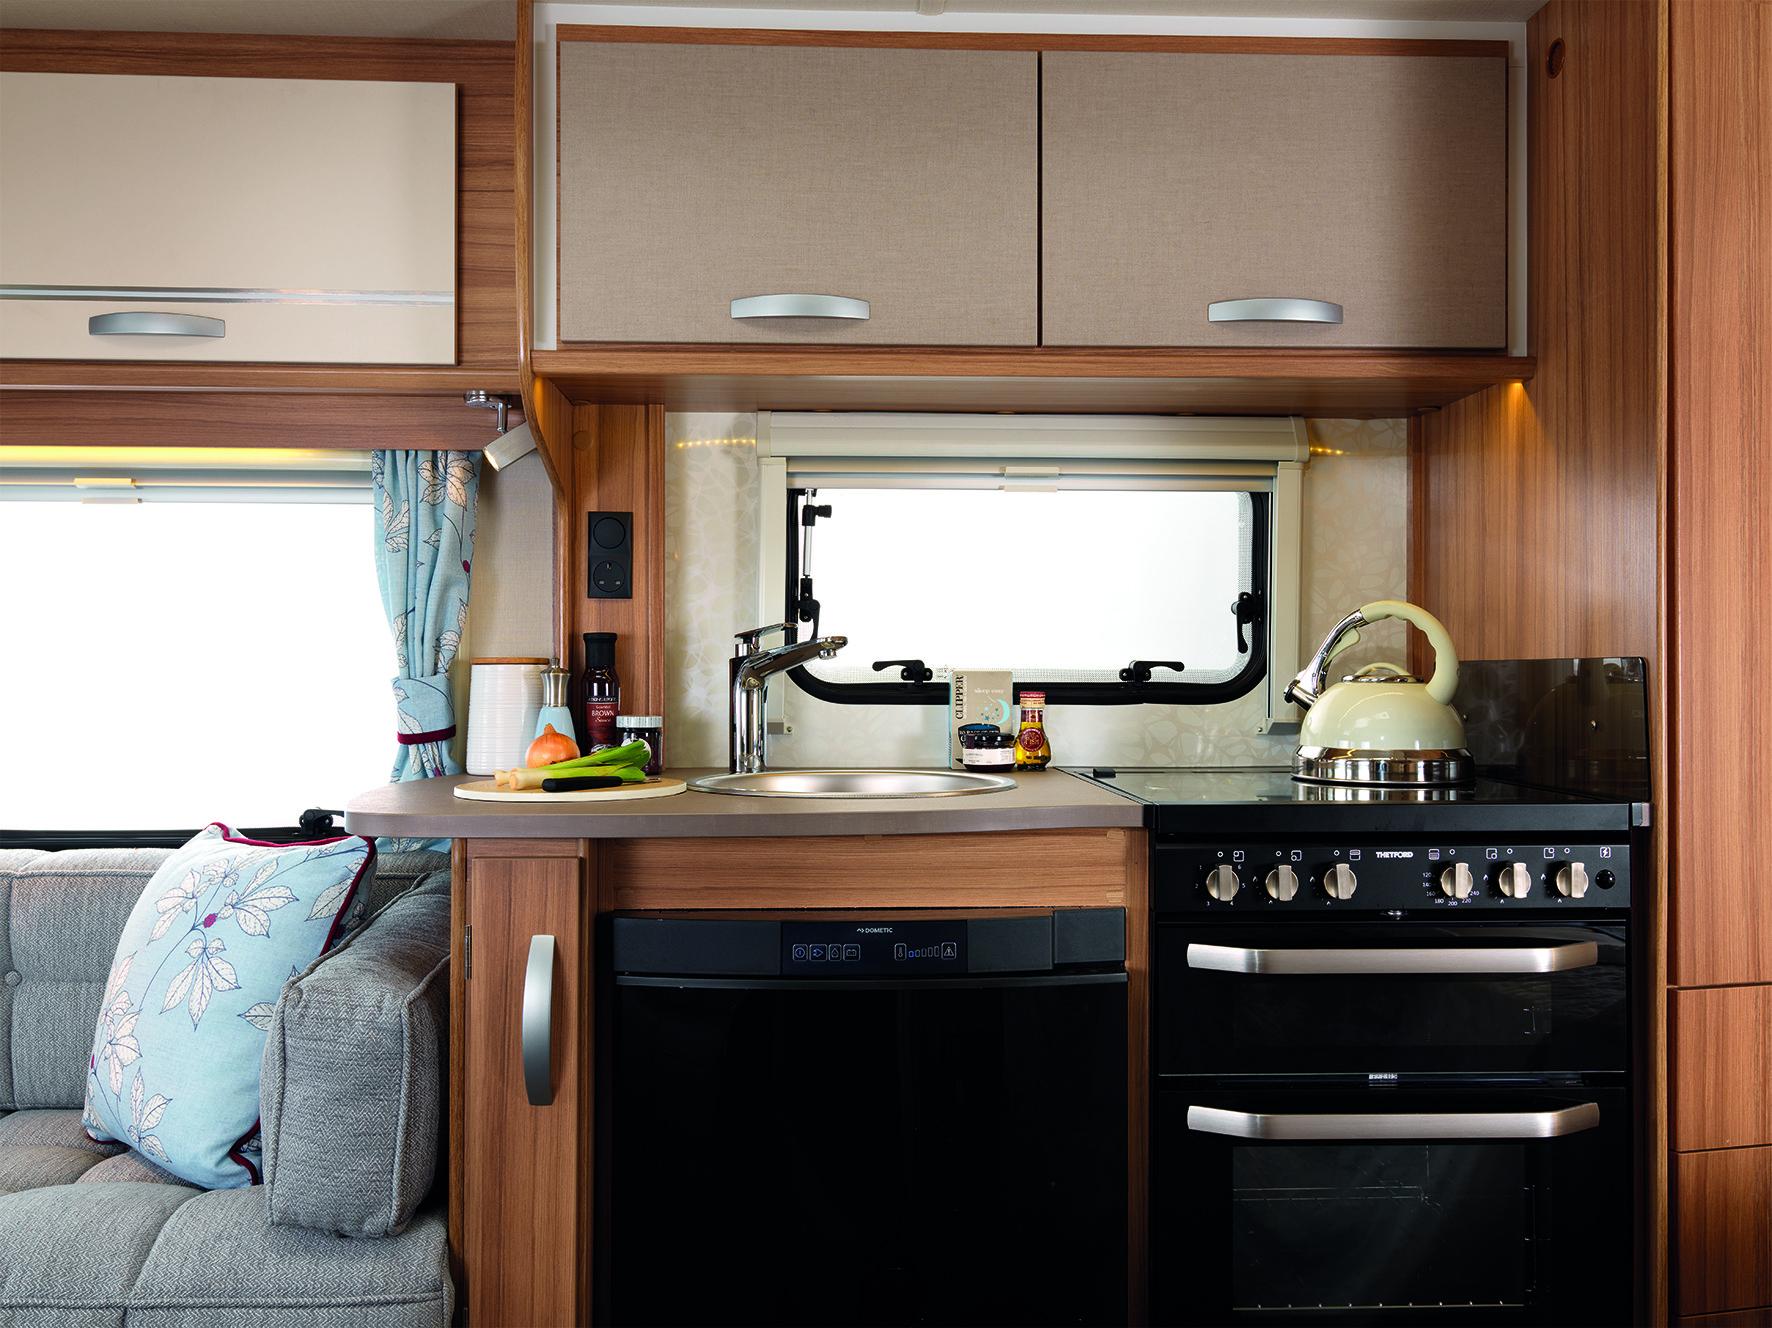 Lunar Caravans Quasar Kitchen